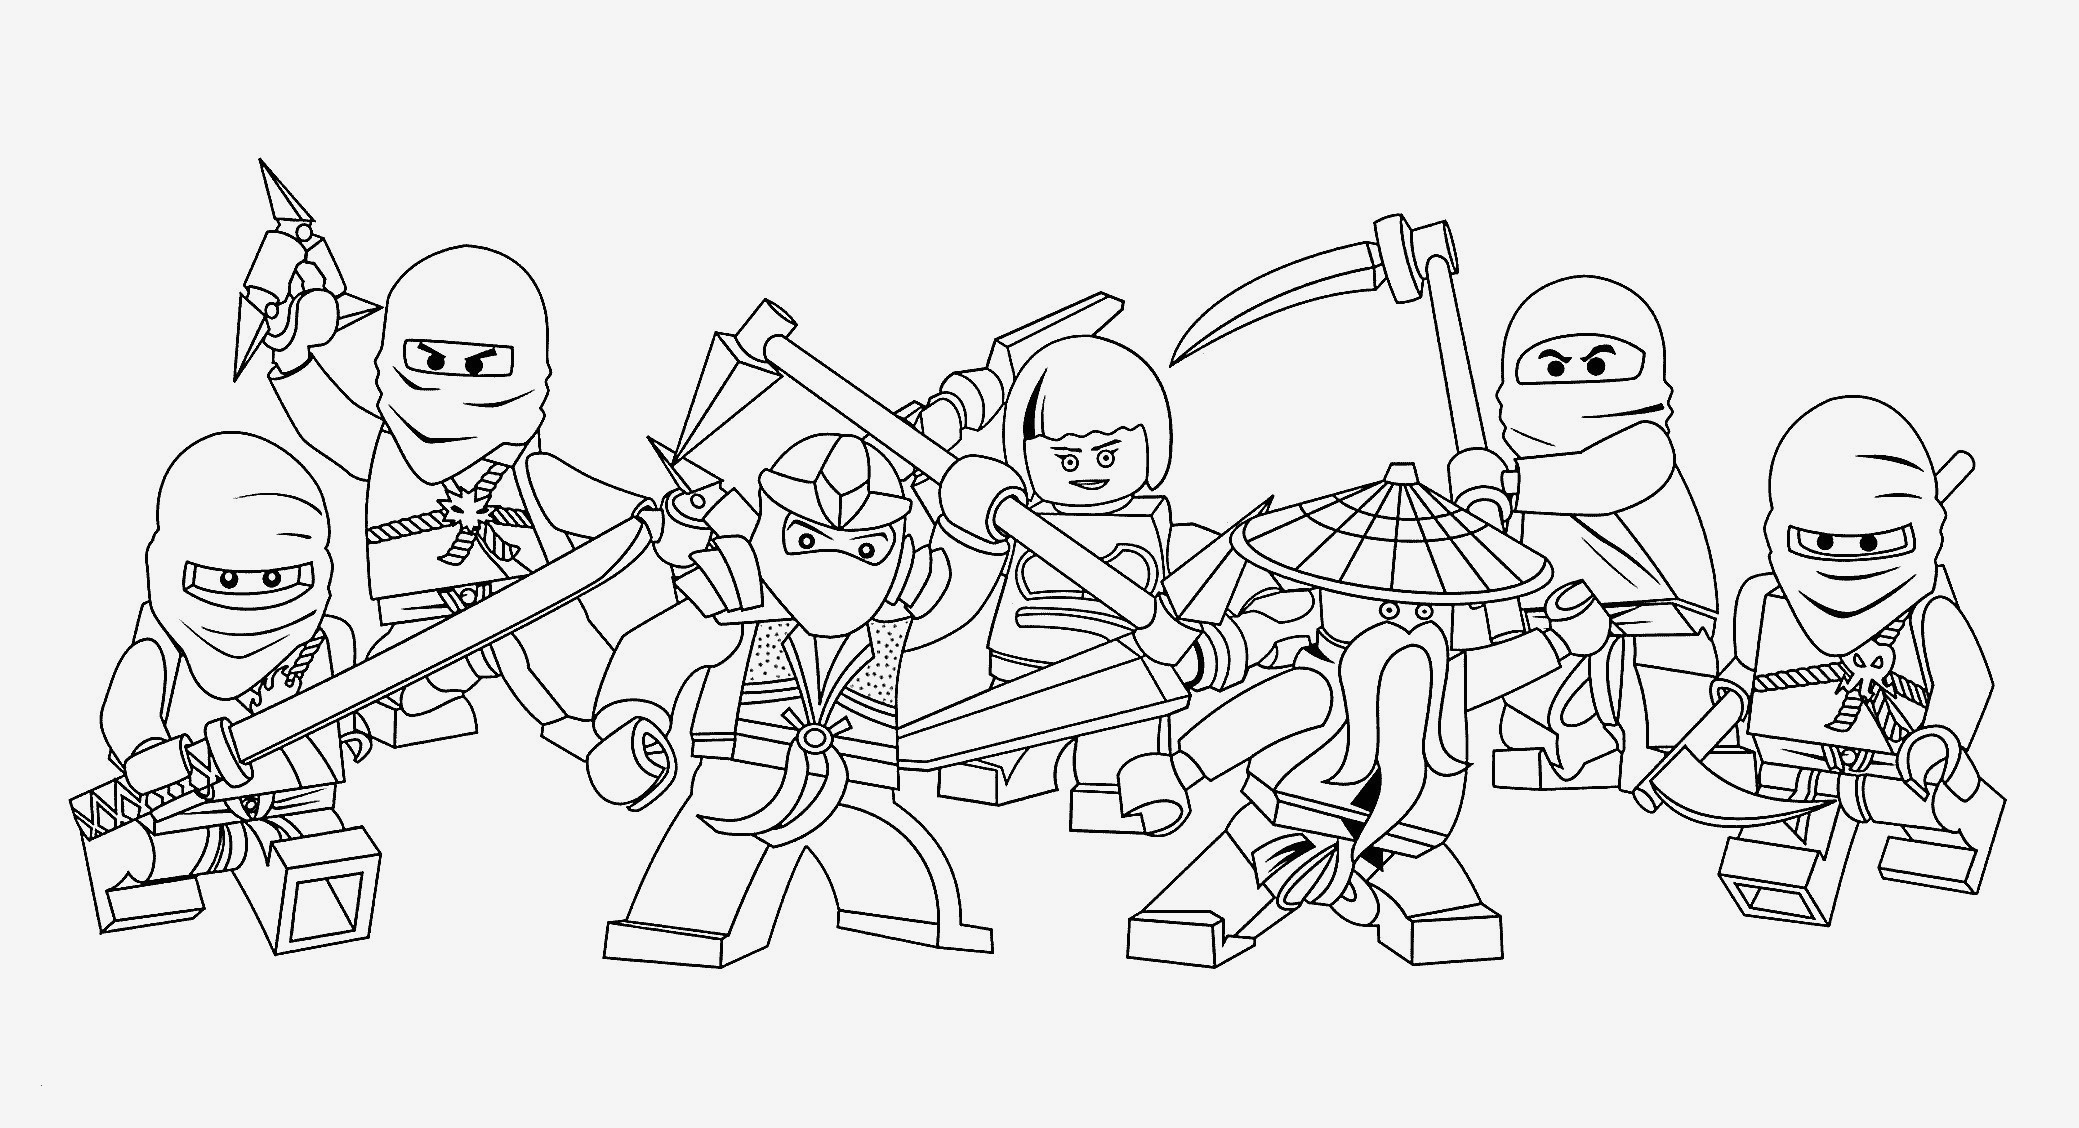 Ausmalbilder Ninjago Nya Inspirierend Bilder Zum Ausmalen Bekommen Ausmalbilder Ninjago Movie Das Bild